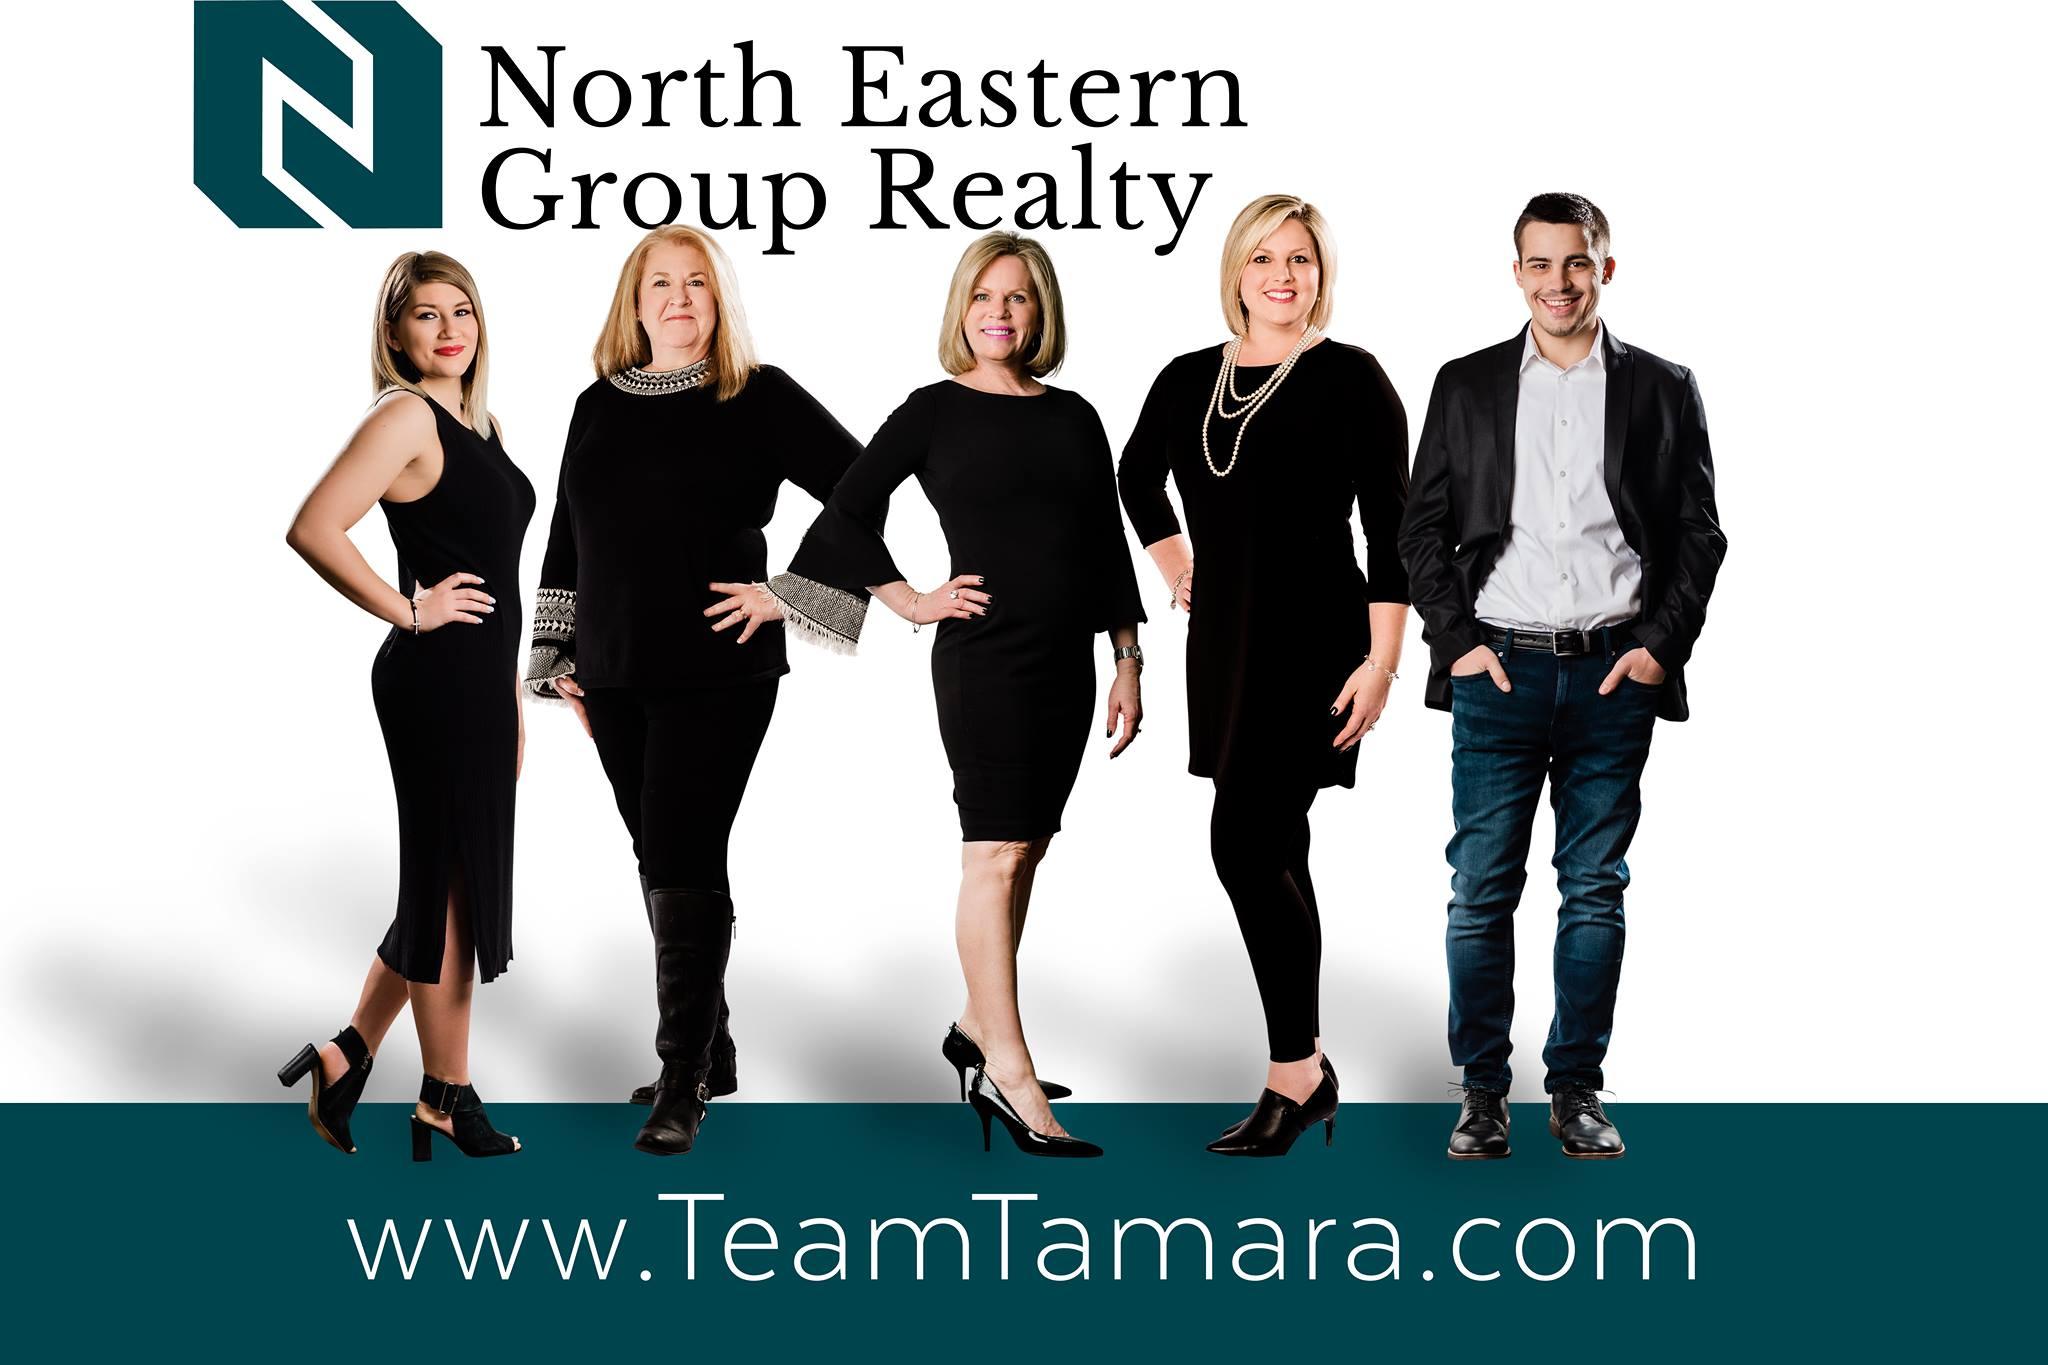 North Eastern Group Realty team Tamara